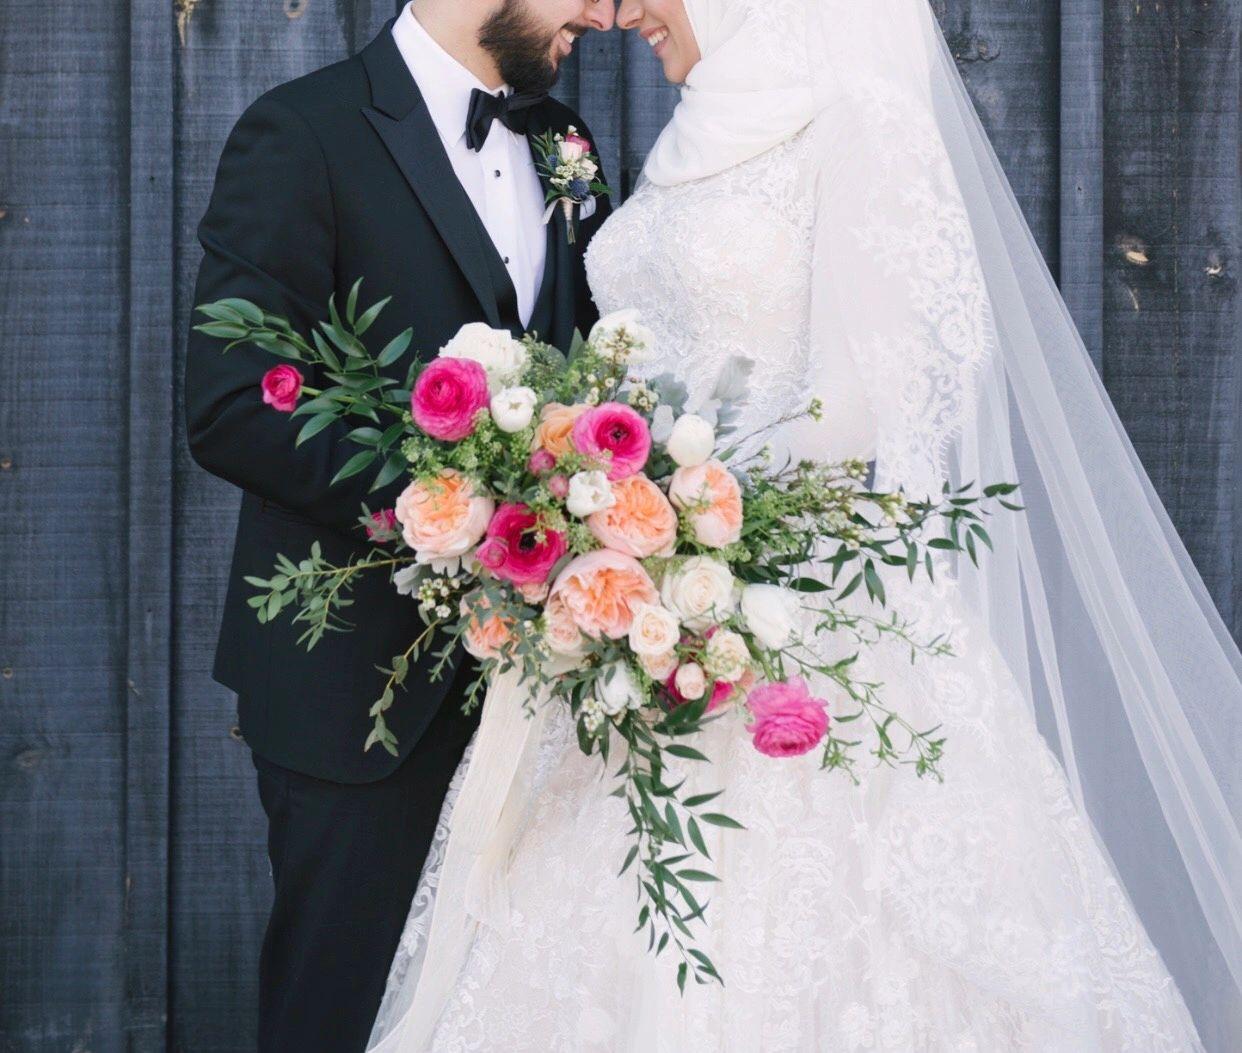 Wedding Event Decor Florist Lina Arango Floral Design Inc